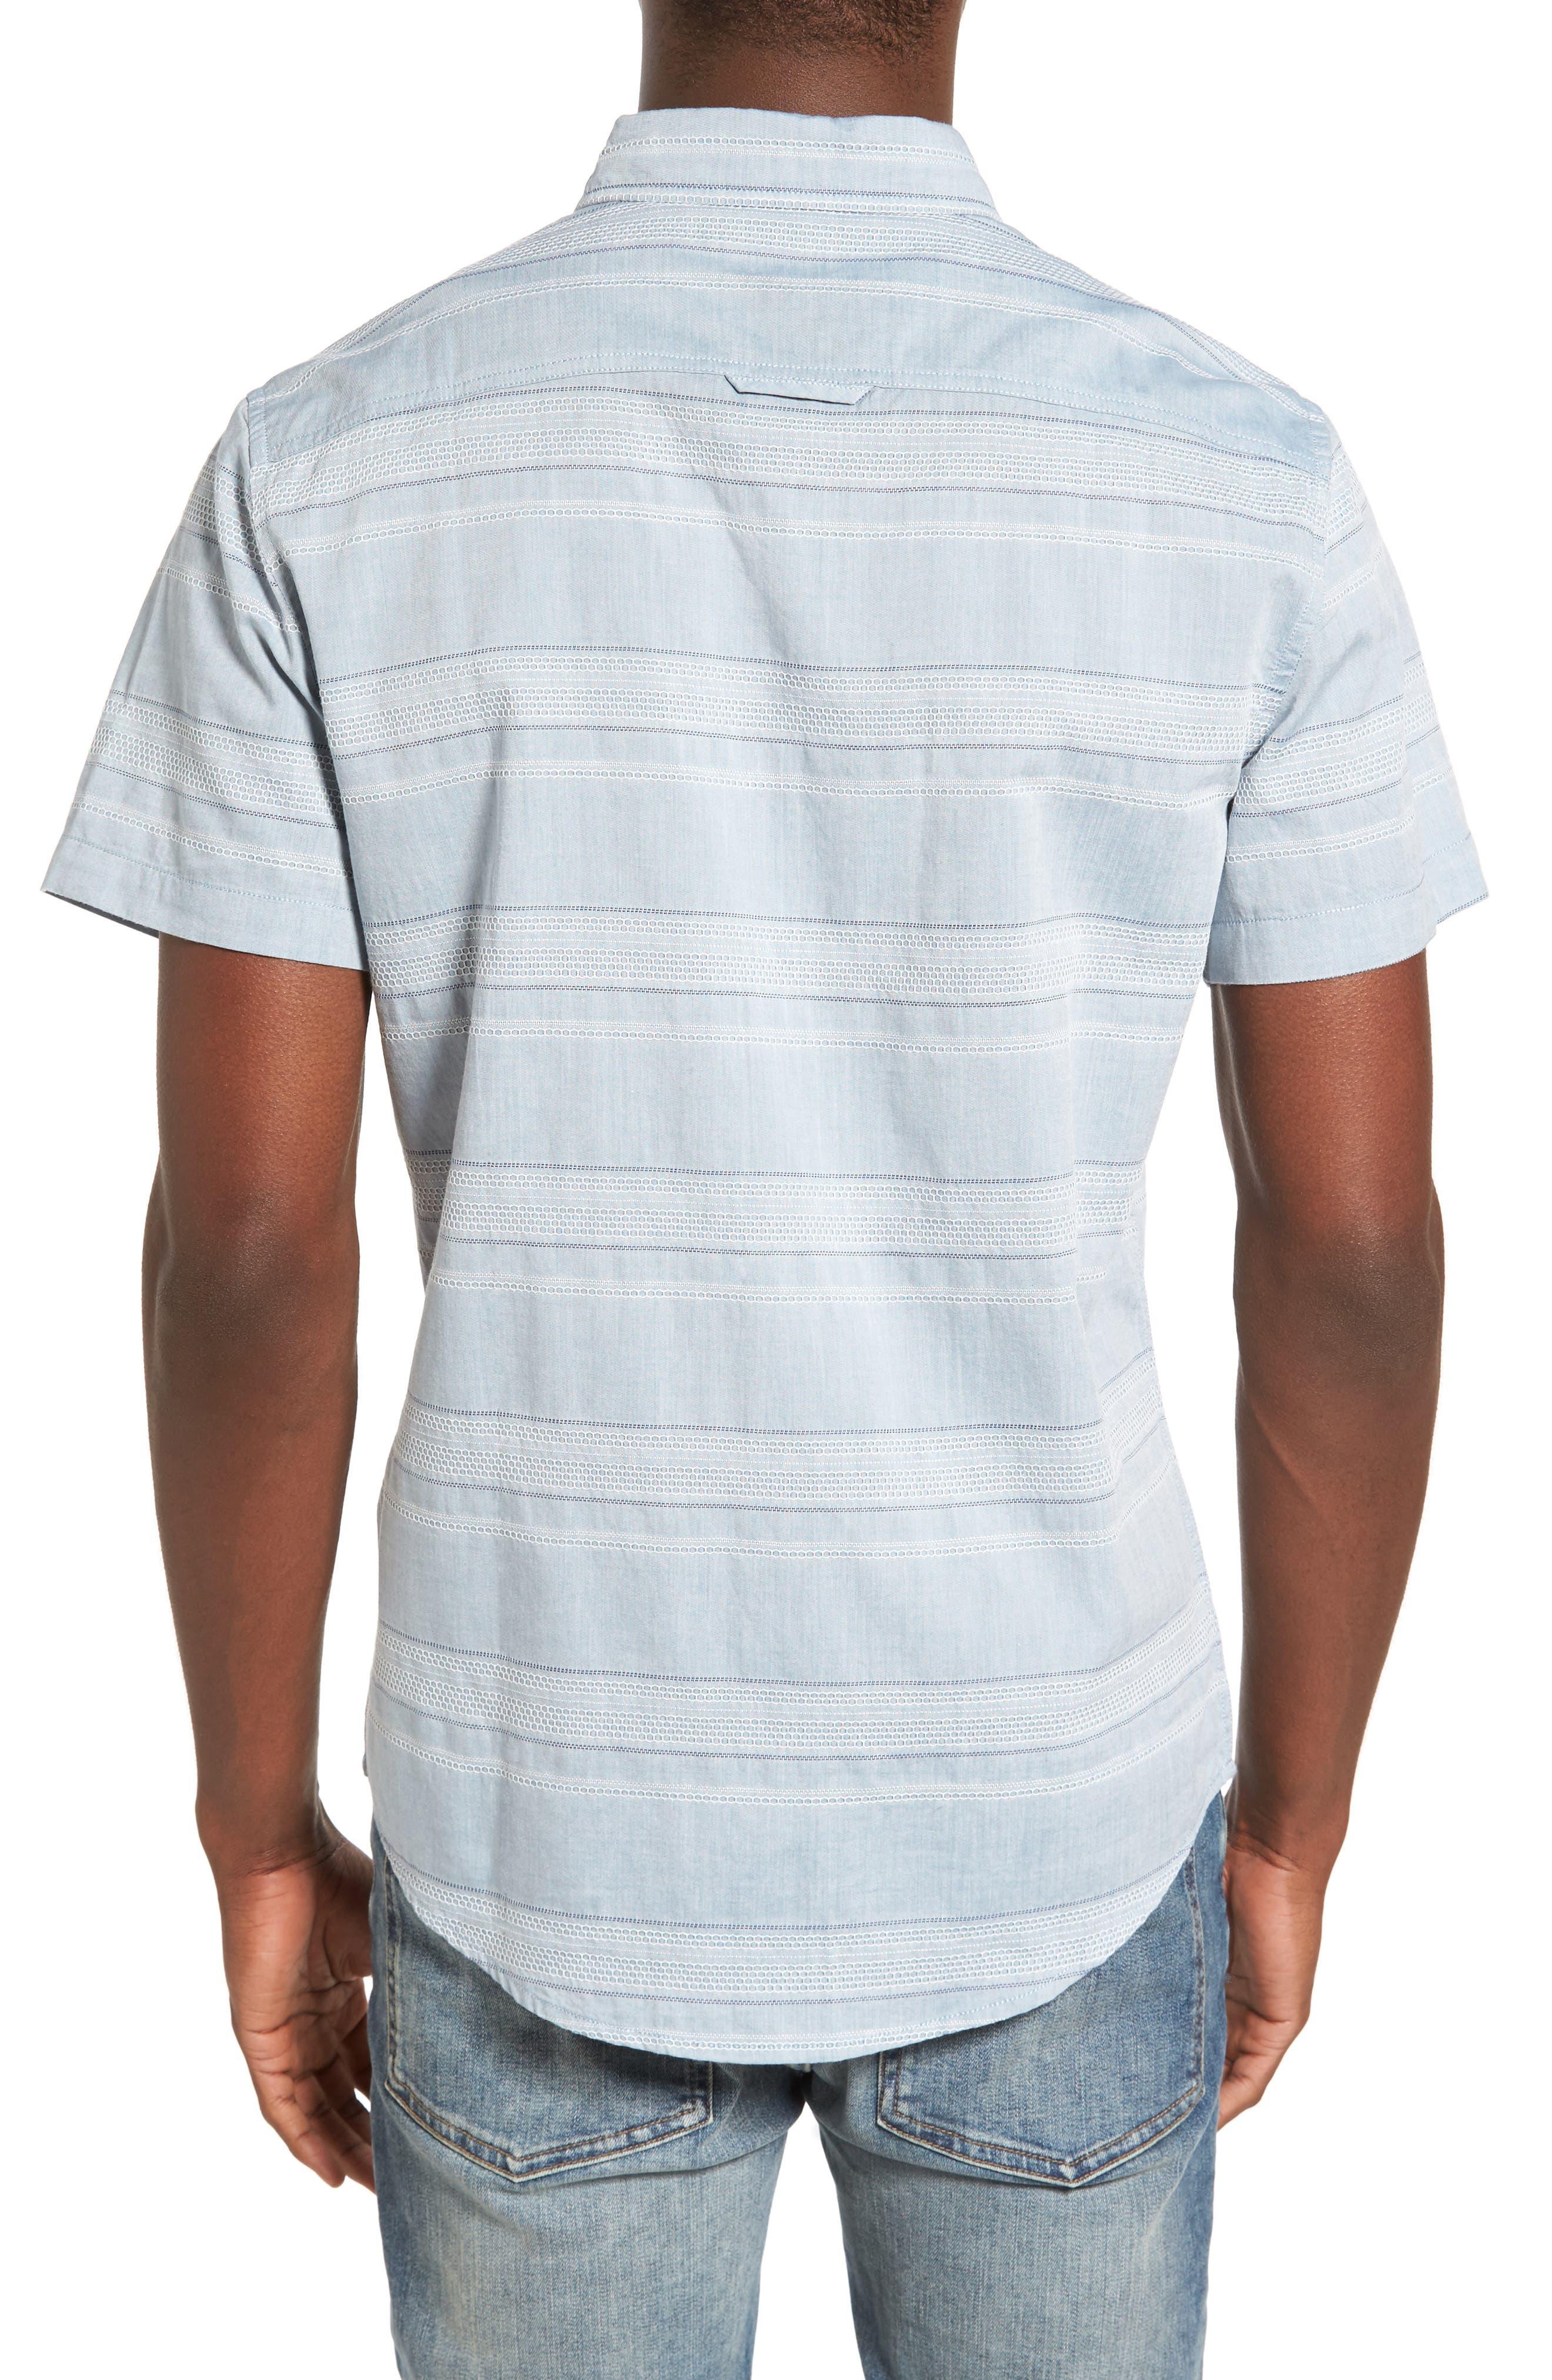 Alternate Image 2  - 1901 Jacquard Trim Fit Sport Shirt